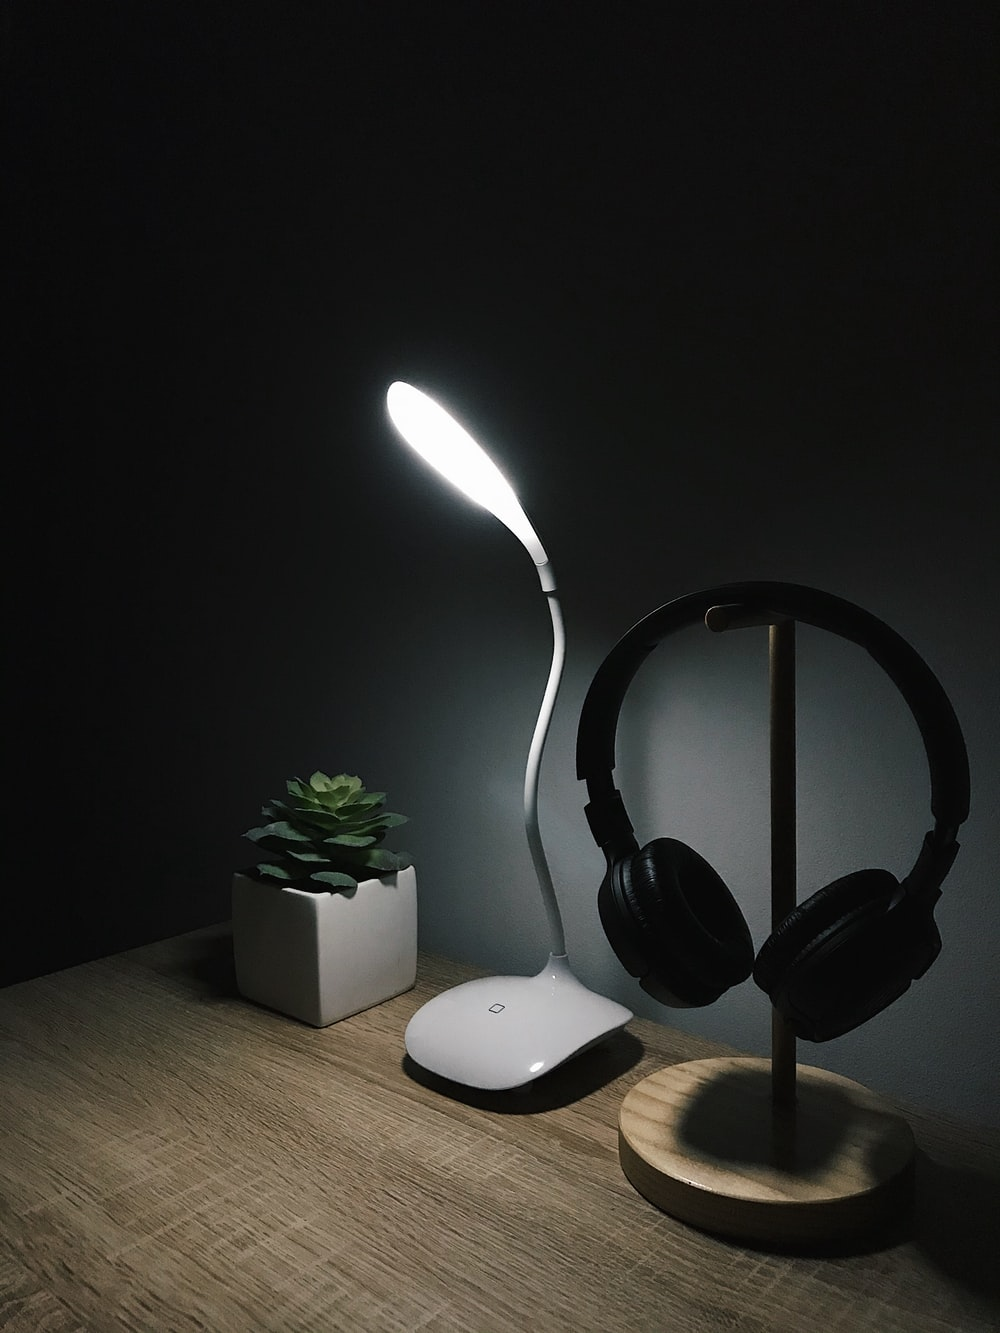 black wireless headphones on brown wooden table